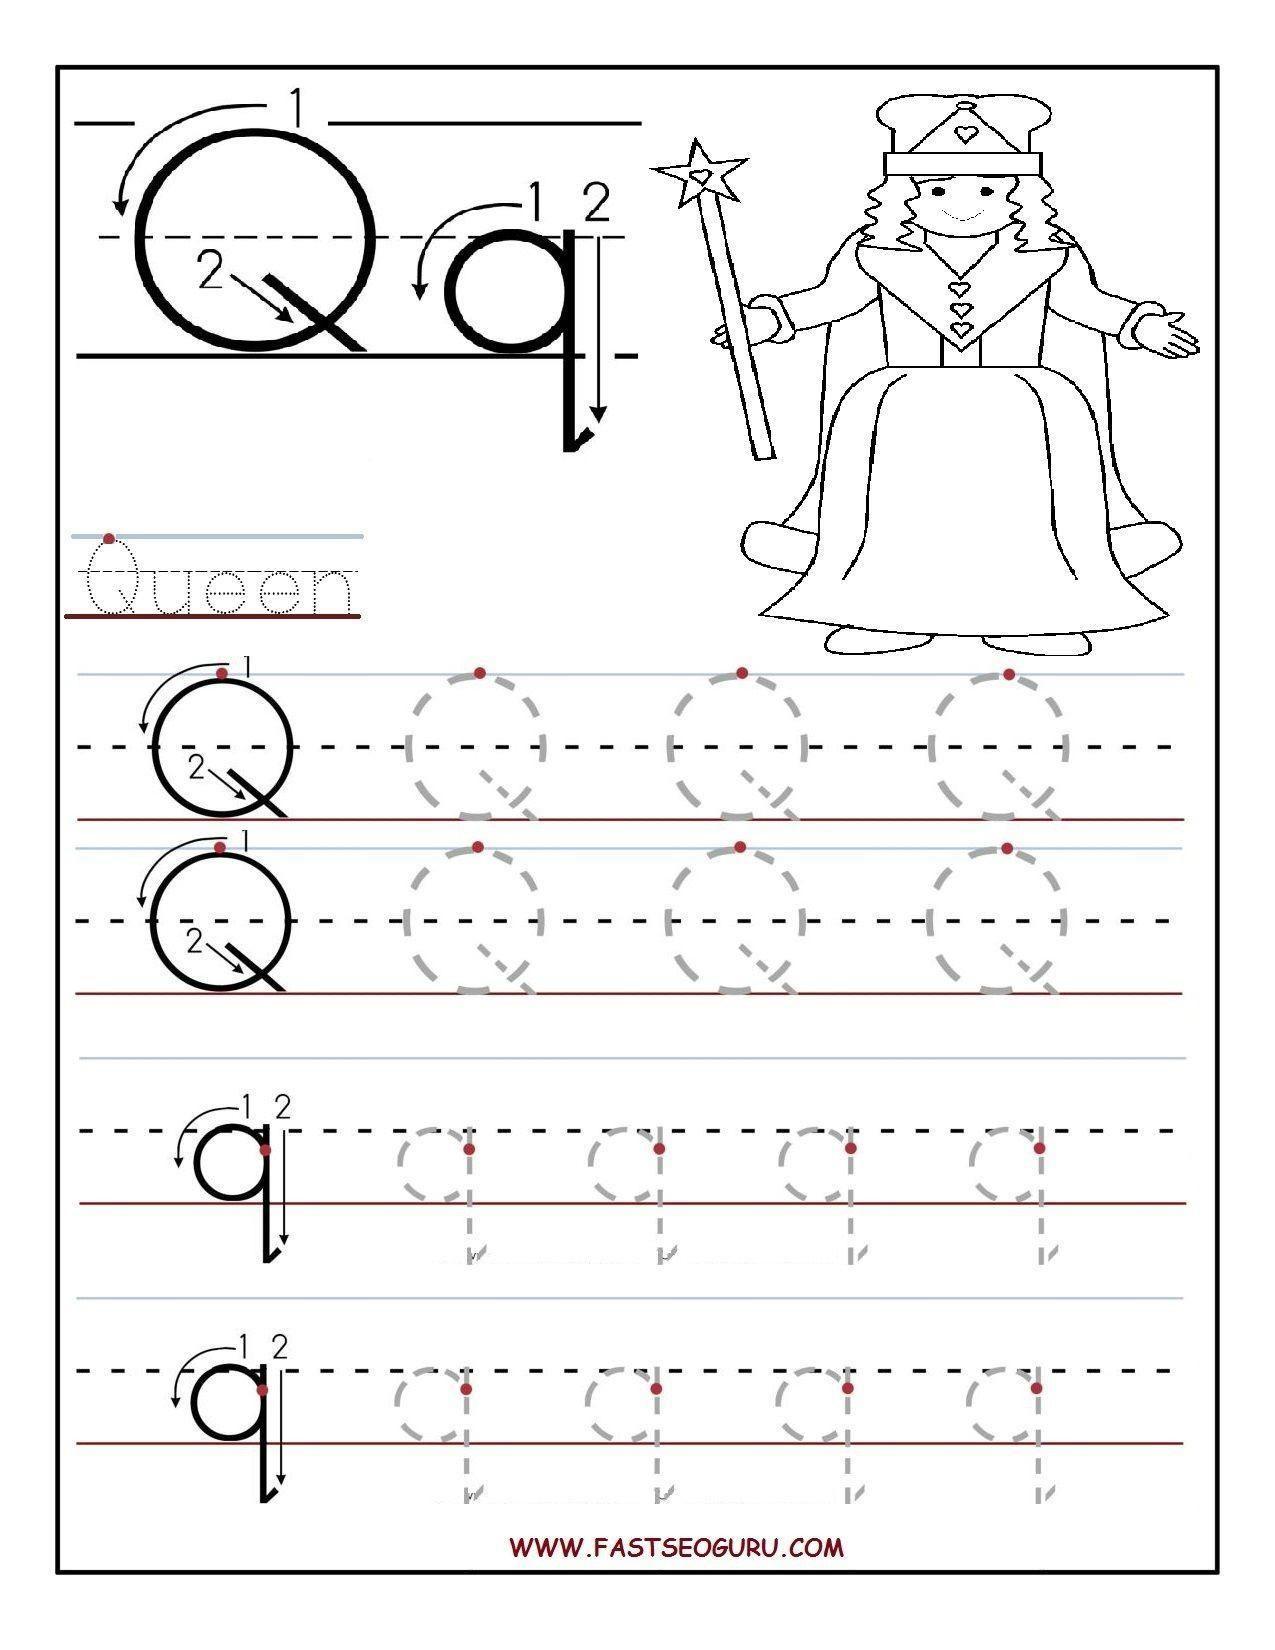 Letter Tracing Templates Preschool In